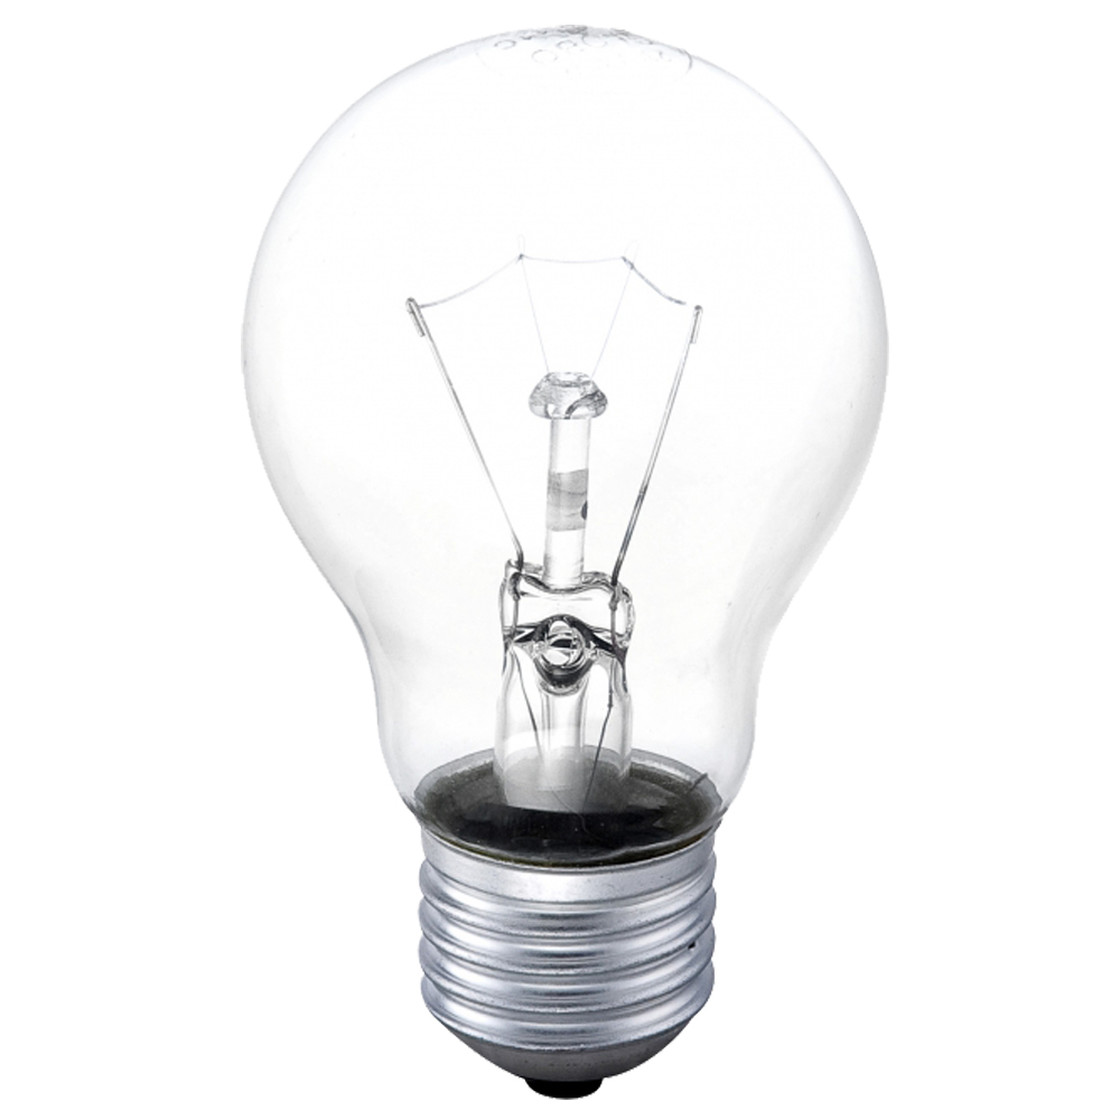 globo 11240a gl hbirne 40w e27 warmweiss lampen rampe de 0 79. Black Bedroom Furniture Sets. Home Design Ideas